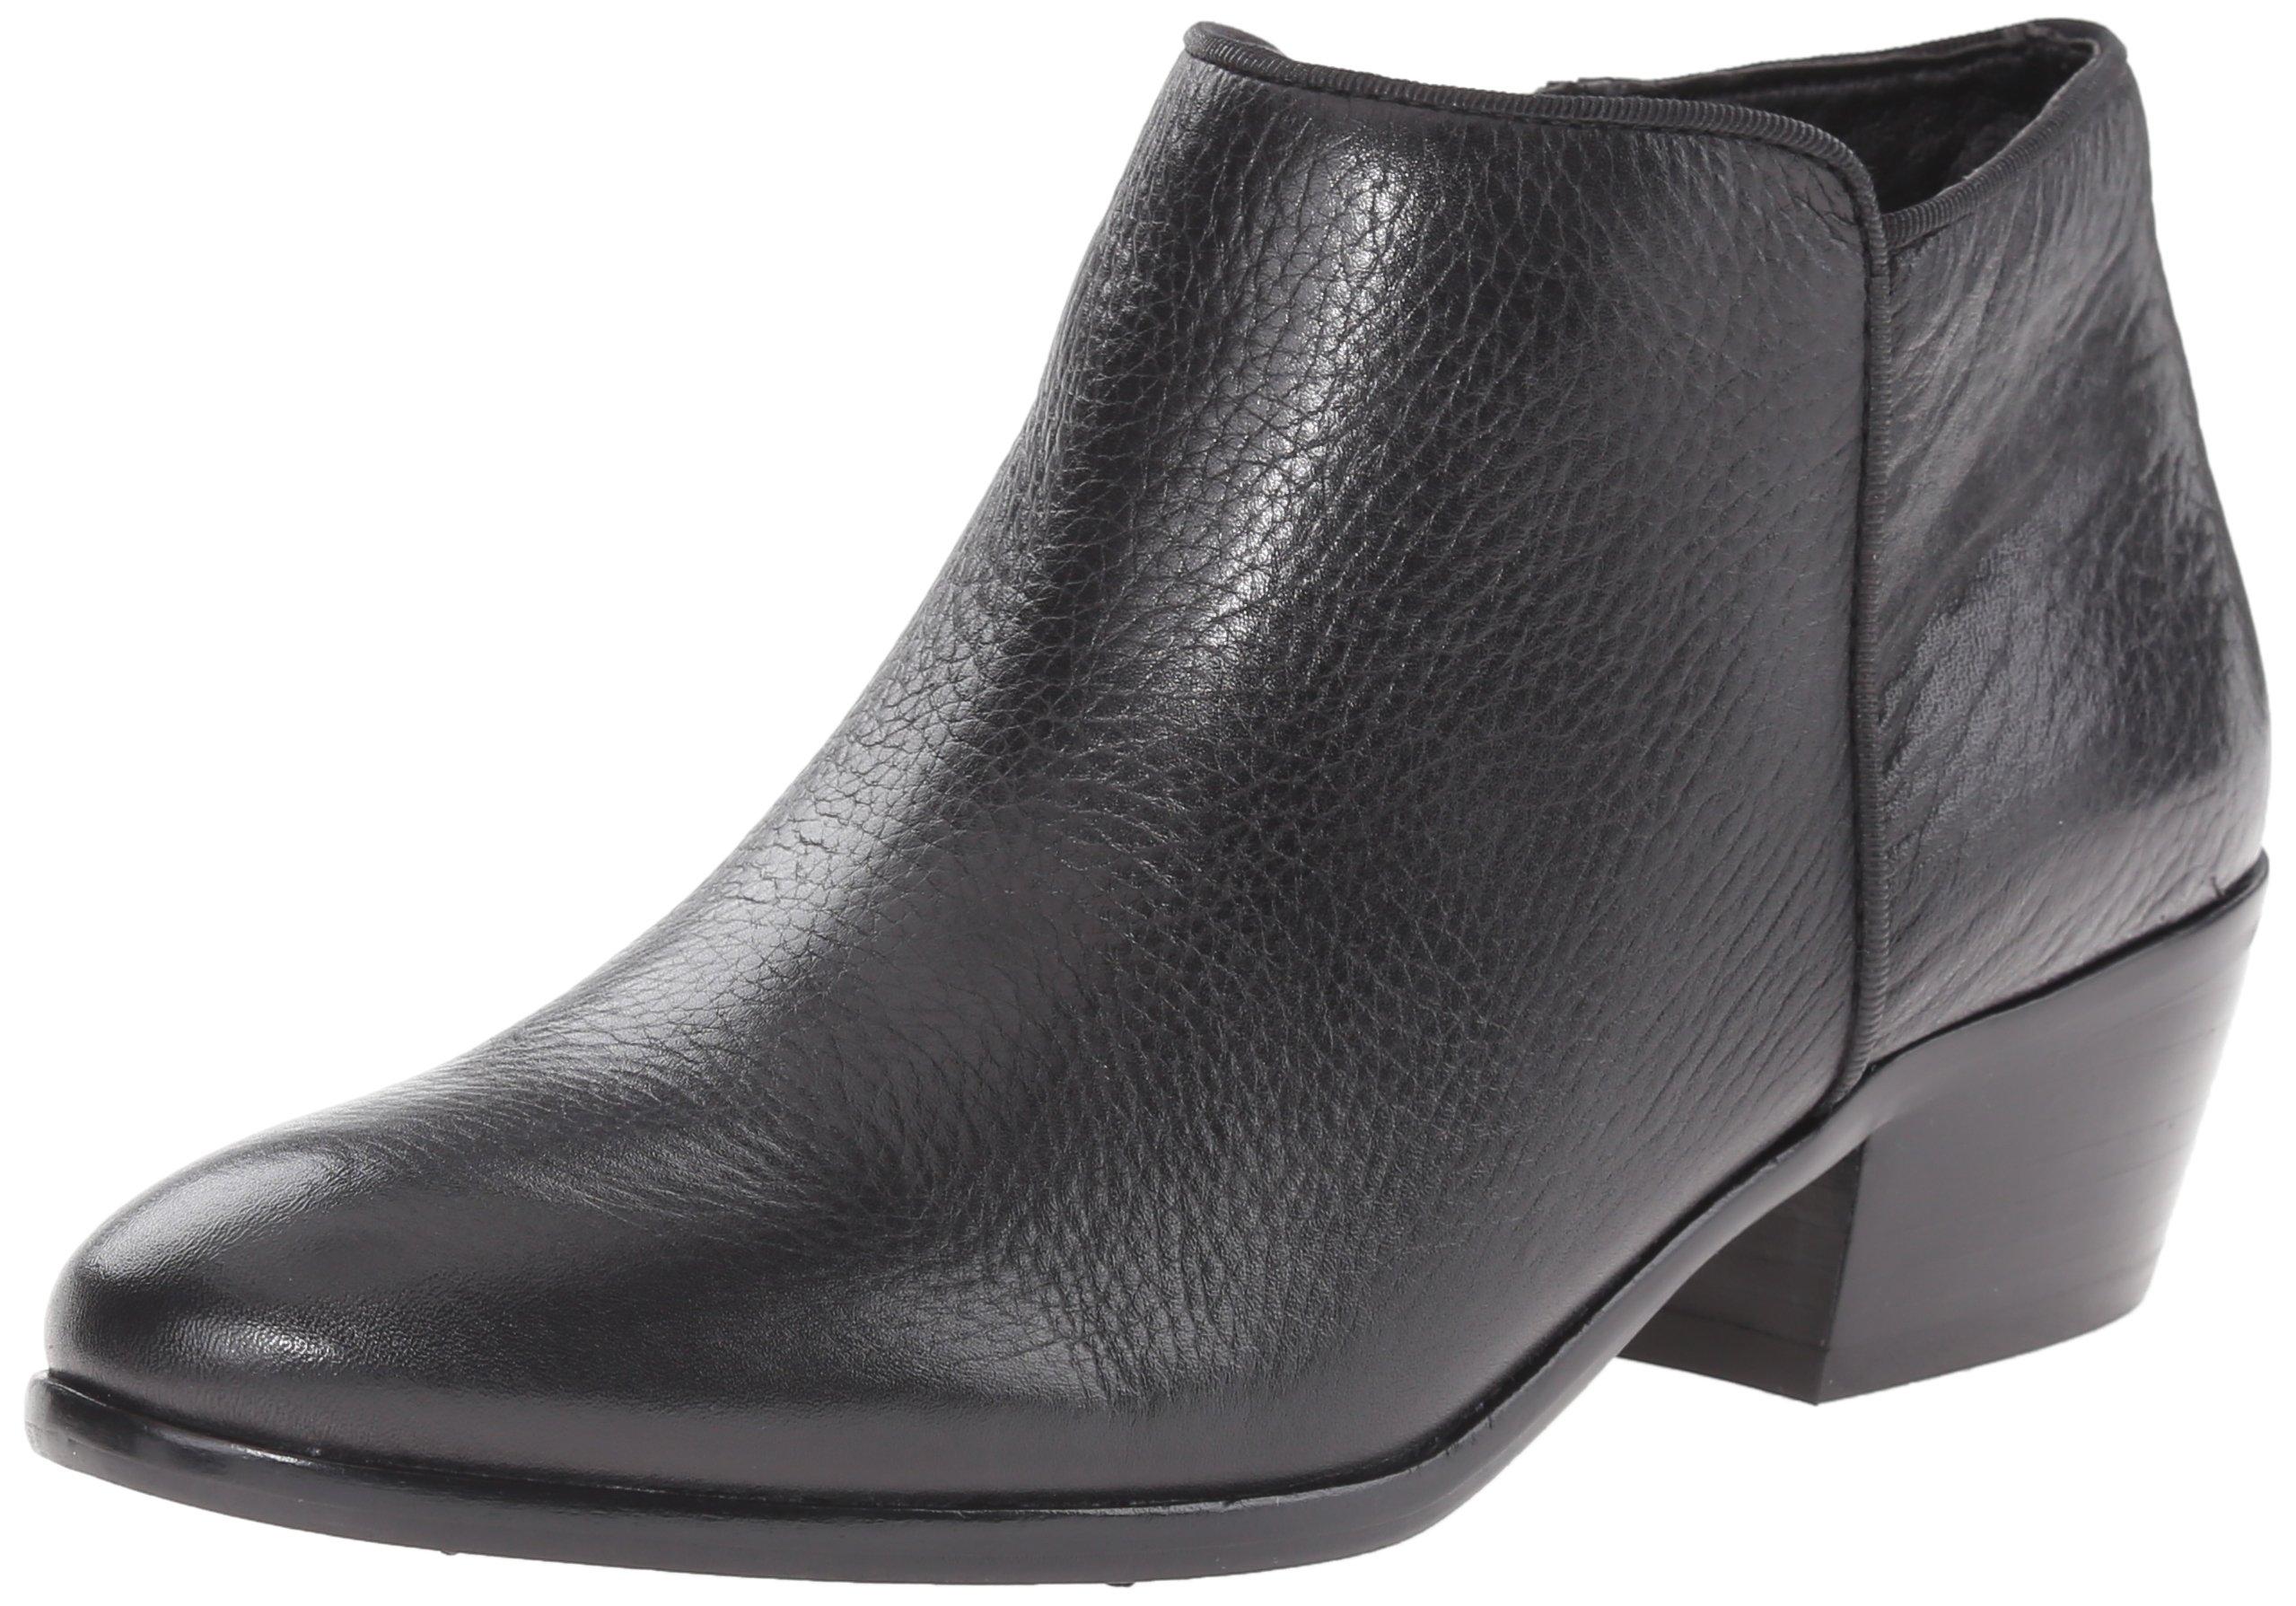 Sam Edelman Women's Petty Ankle Bootie, Black Leather, 8.5 M US